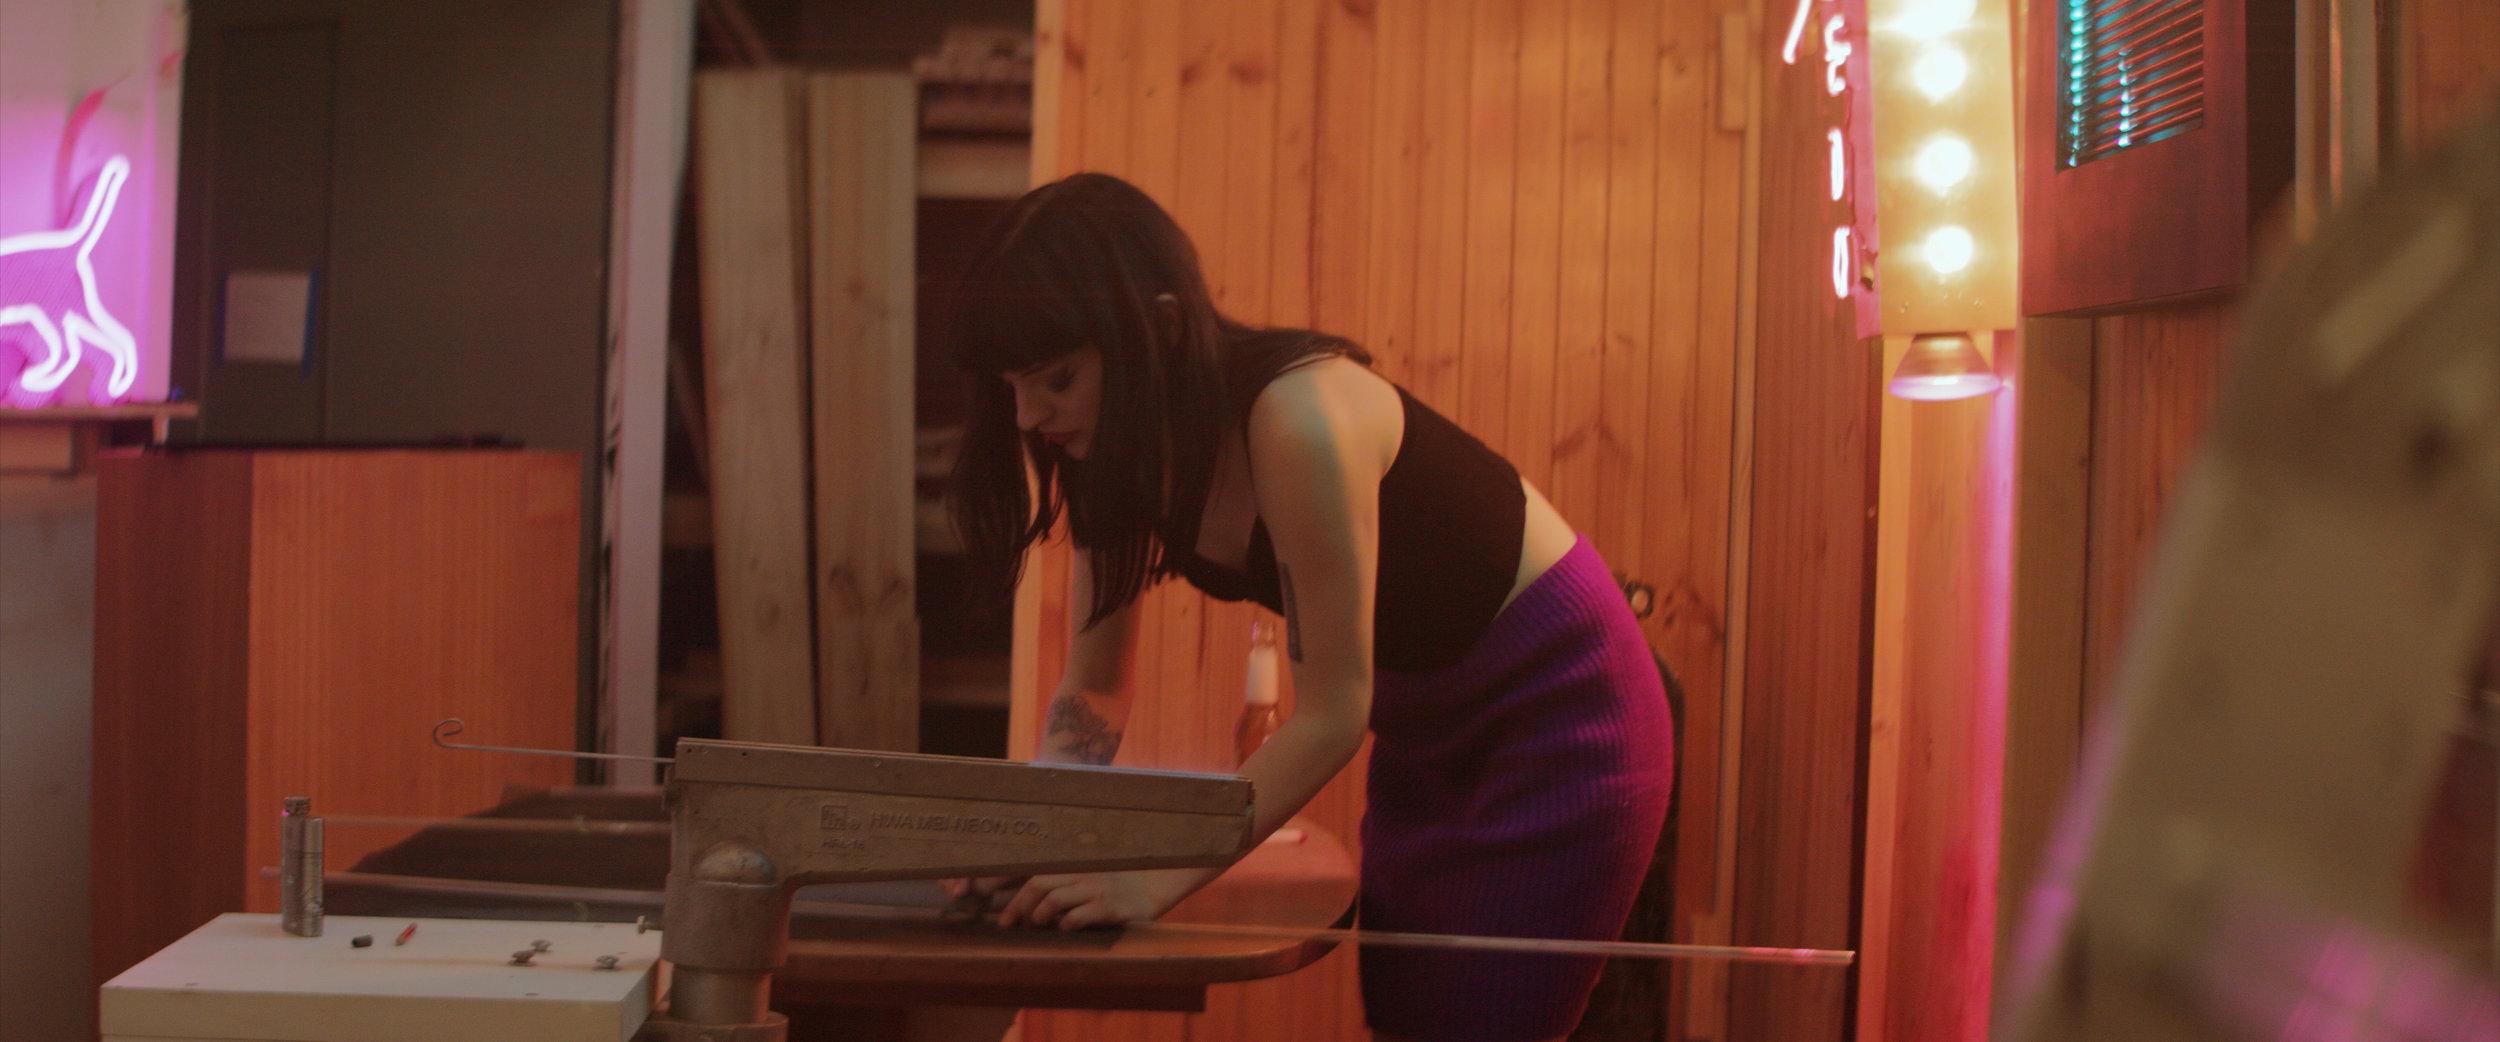 Emma-Kate Hart Neon Studio Bending.jpg